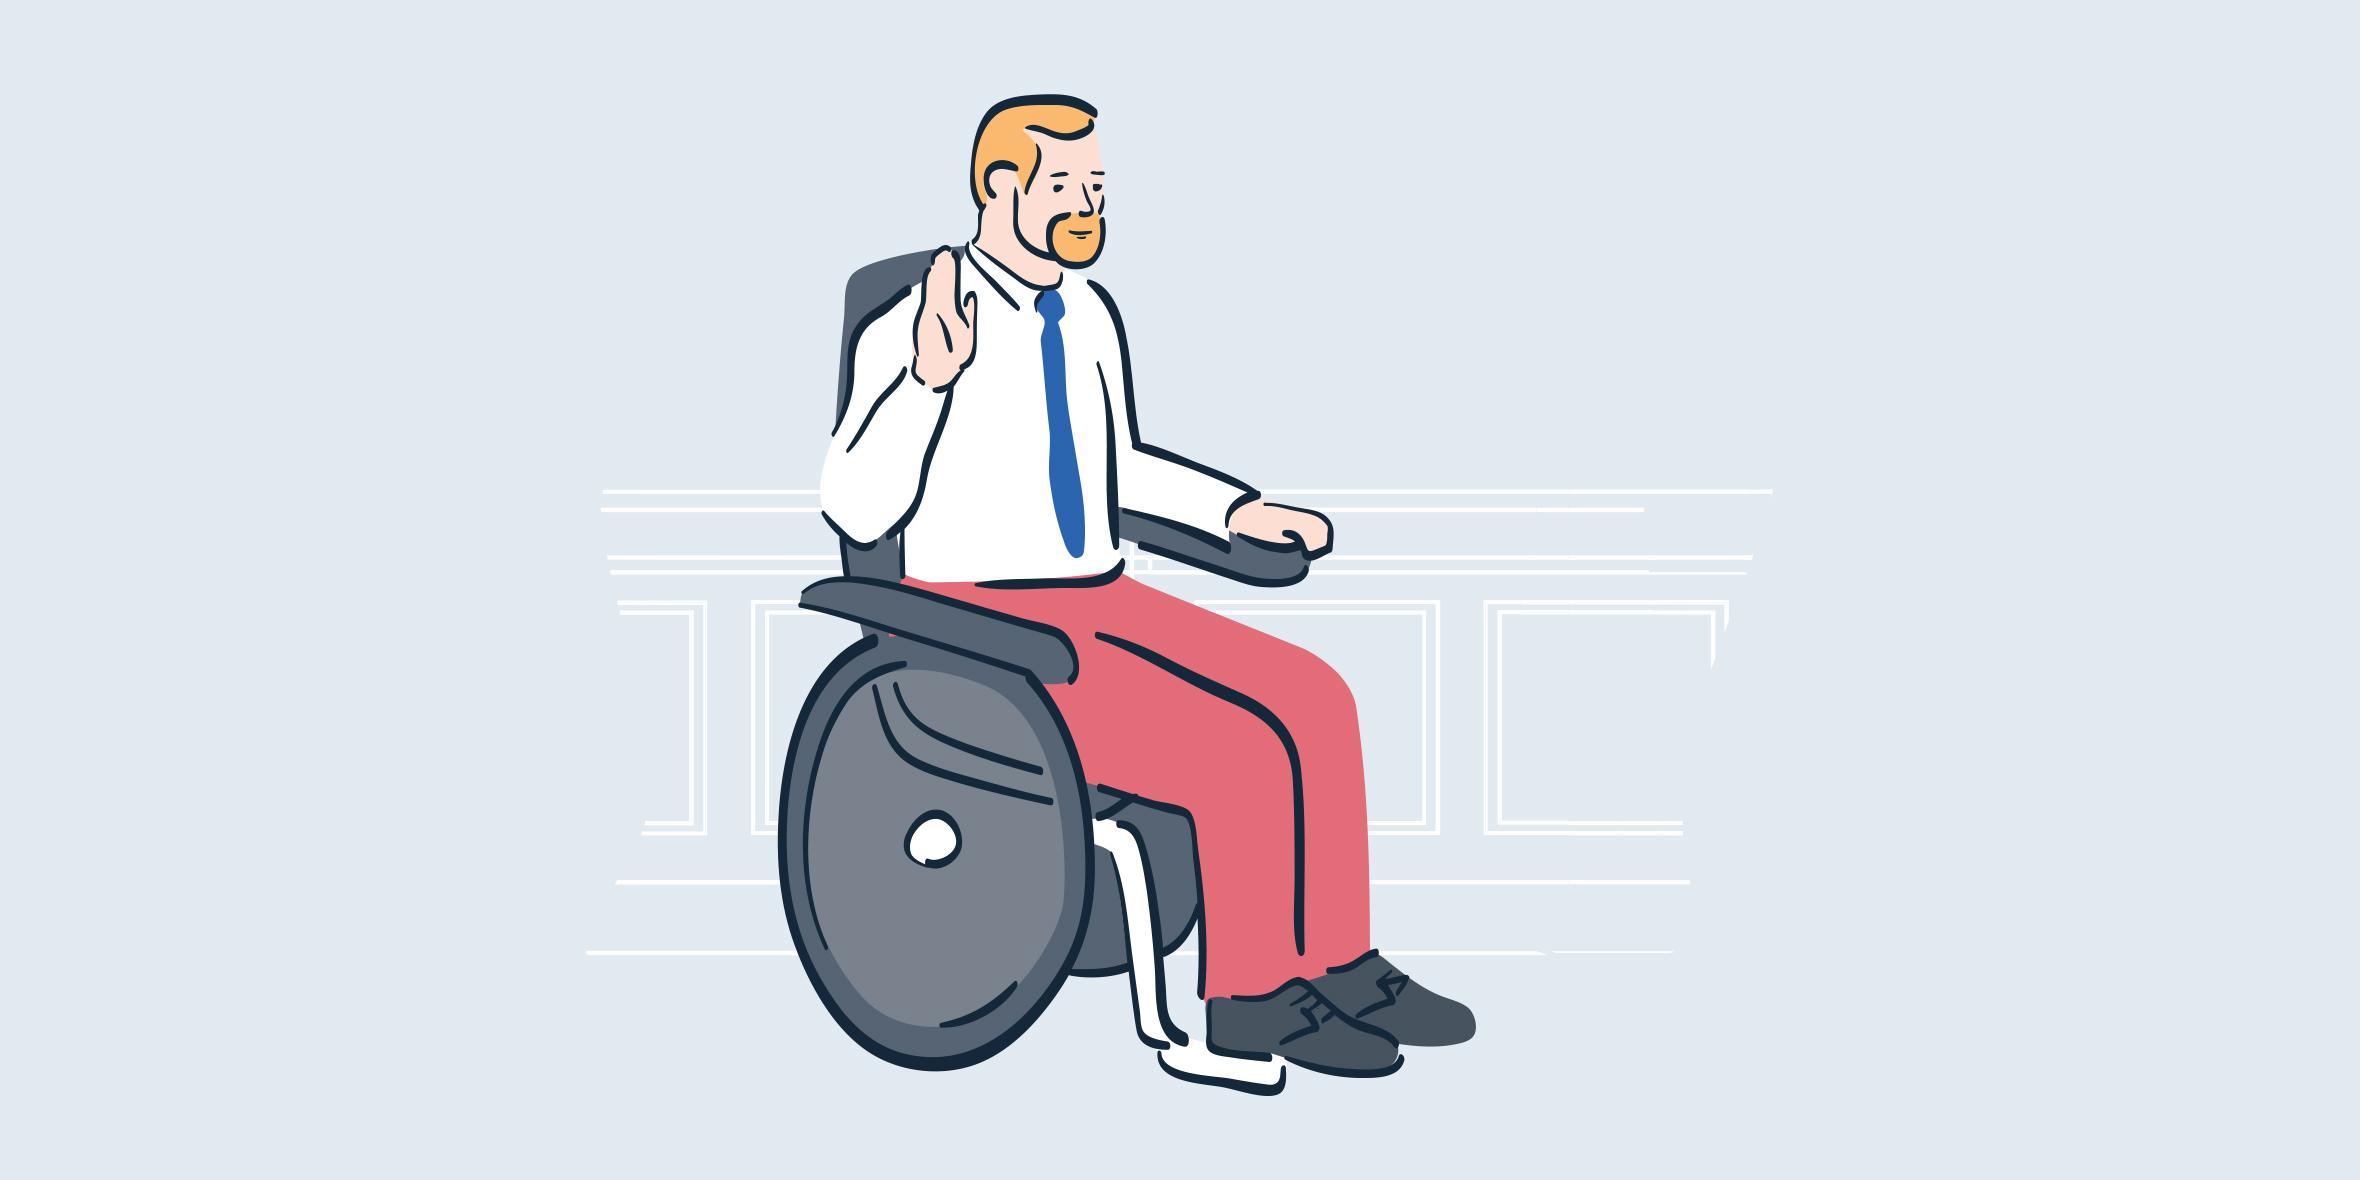 illustration of man in wheelchair raising right hand